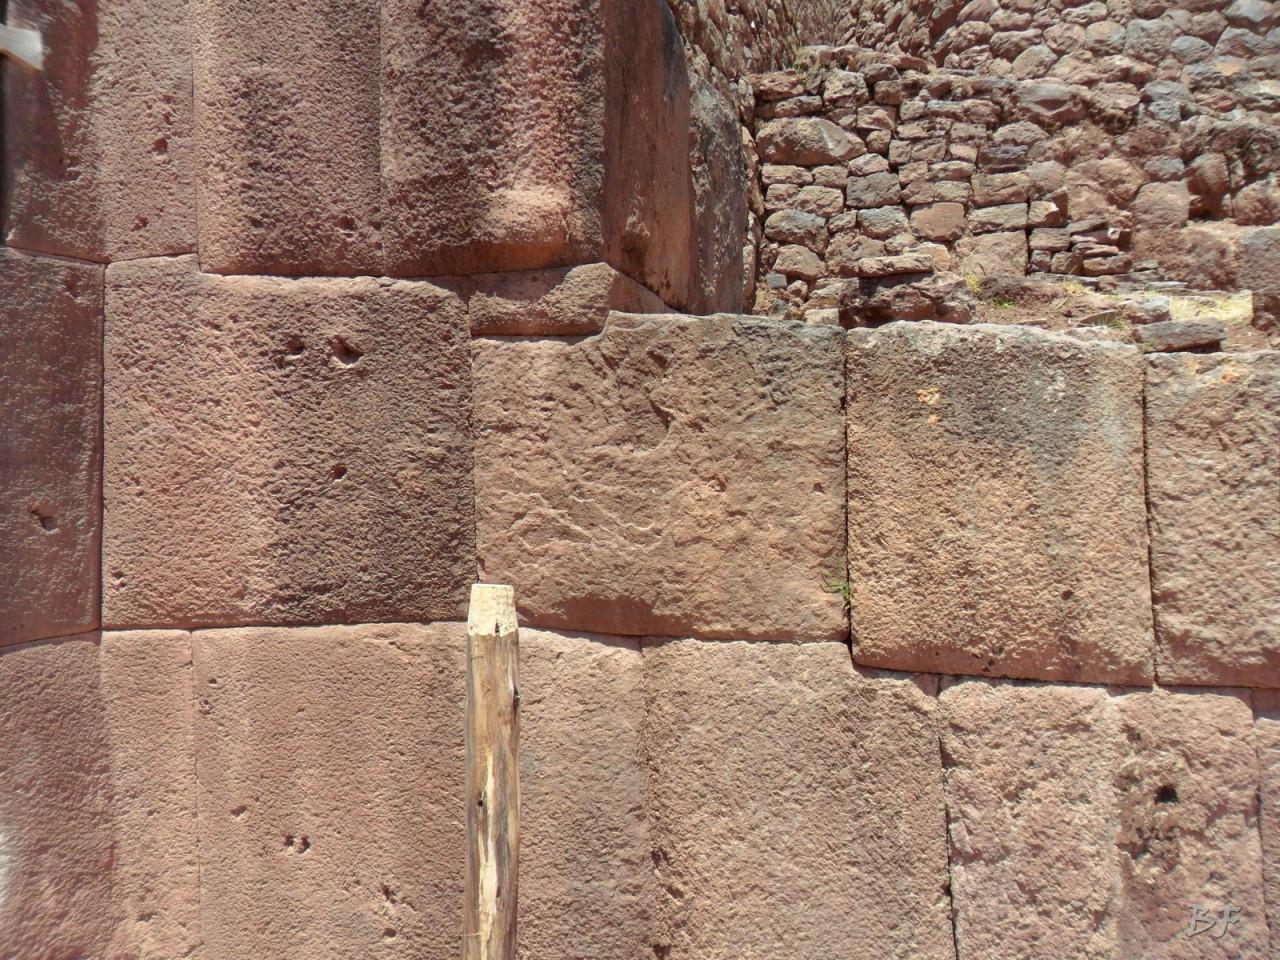 Parco-Archeologico-Megaliti-Rumicolca-Cusco-Perù-10